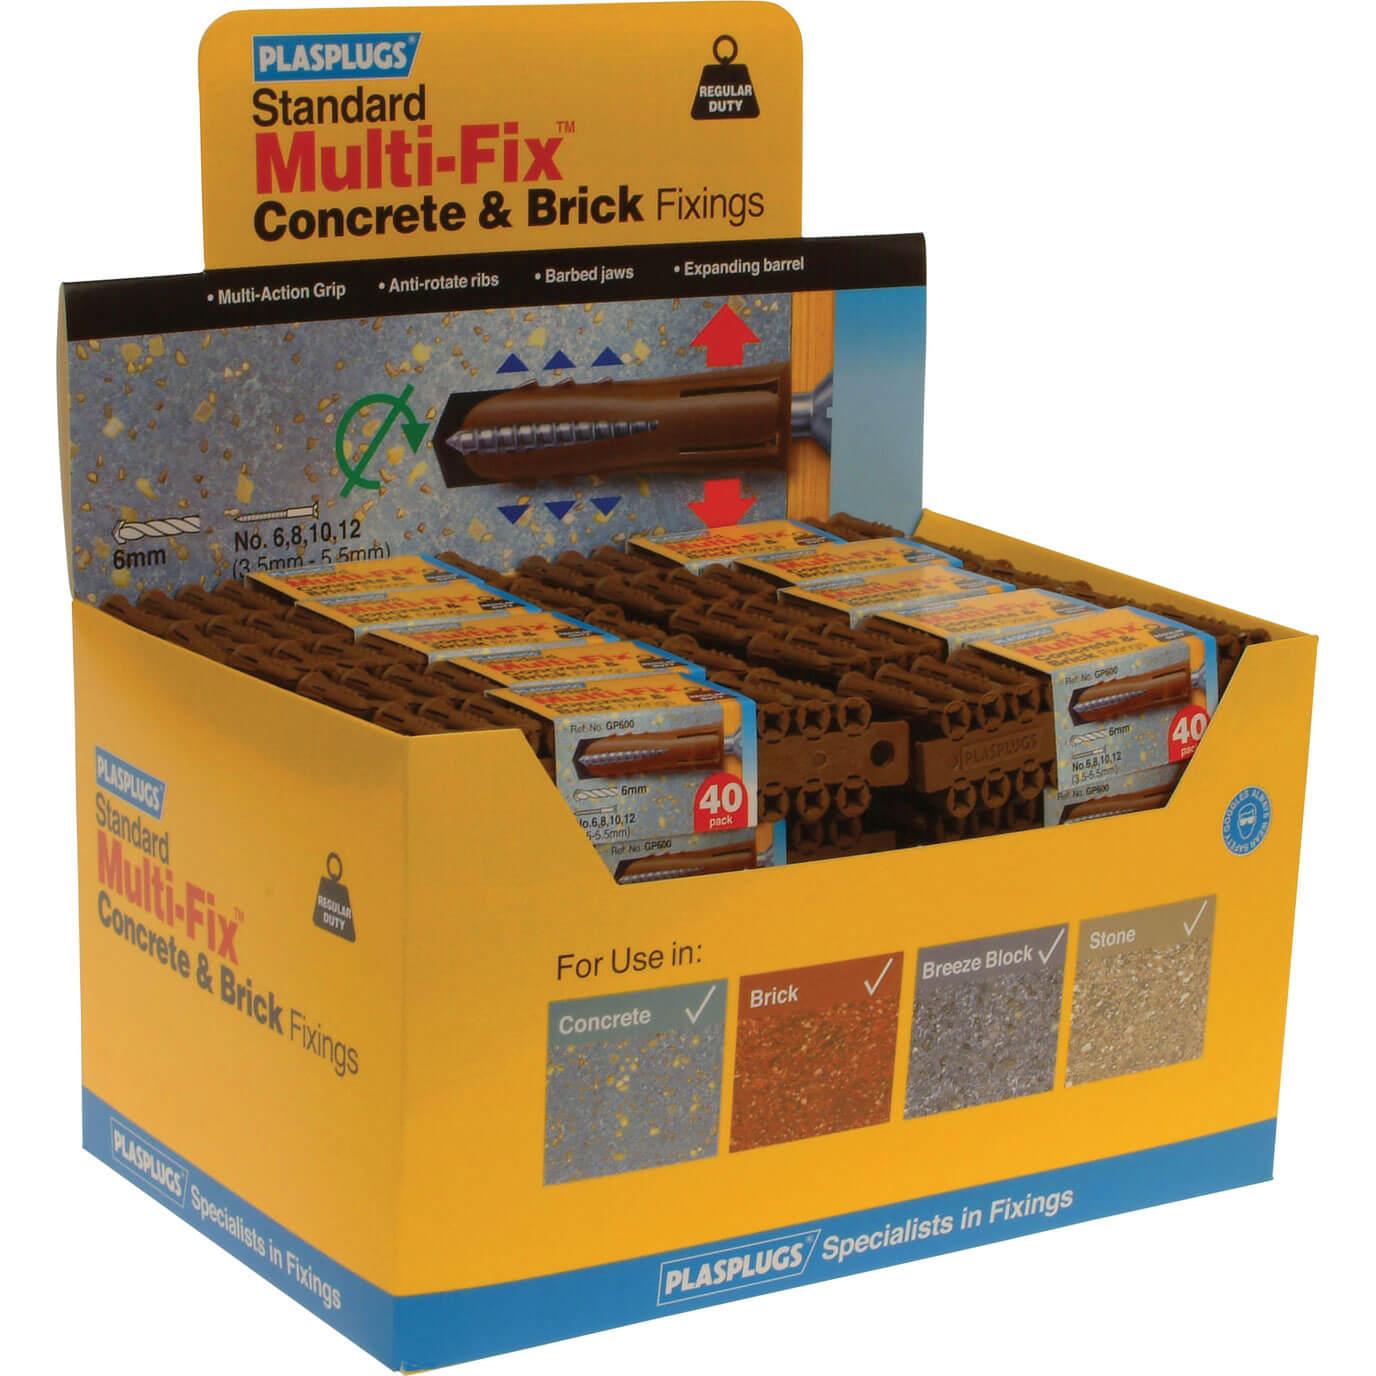 Image of Plasplugs Heavy Duty Multifix Concrete & Brick Fixings Pack of 2000